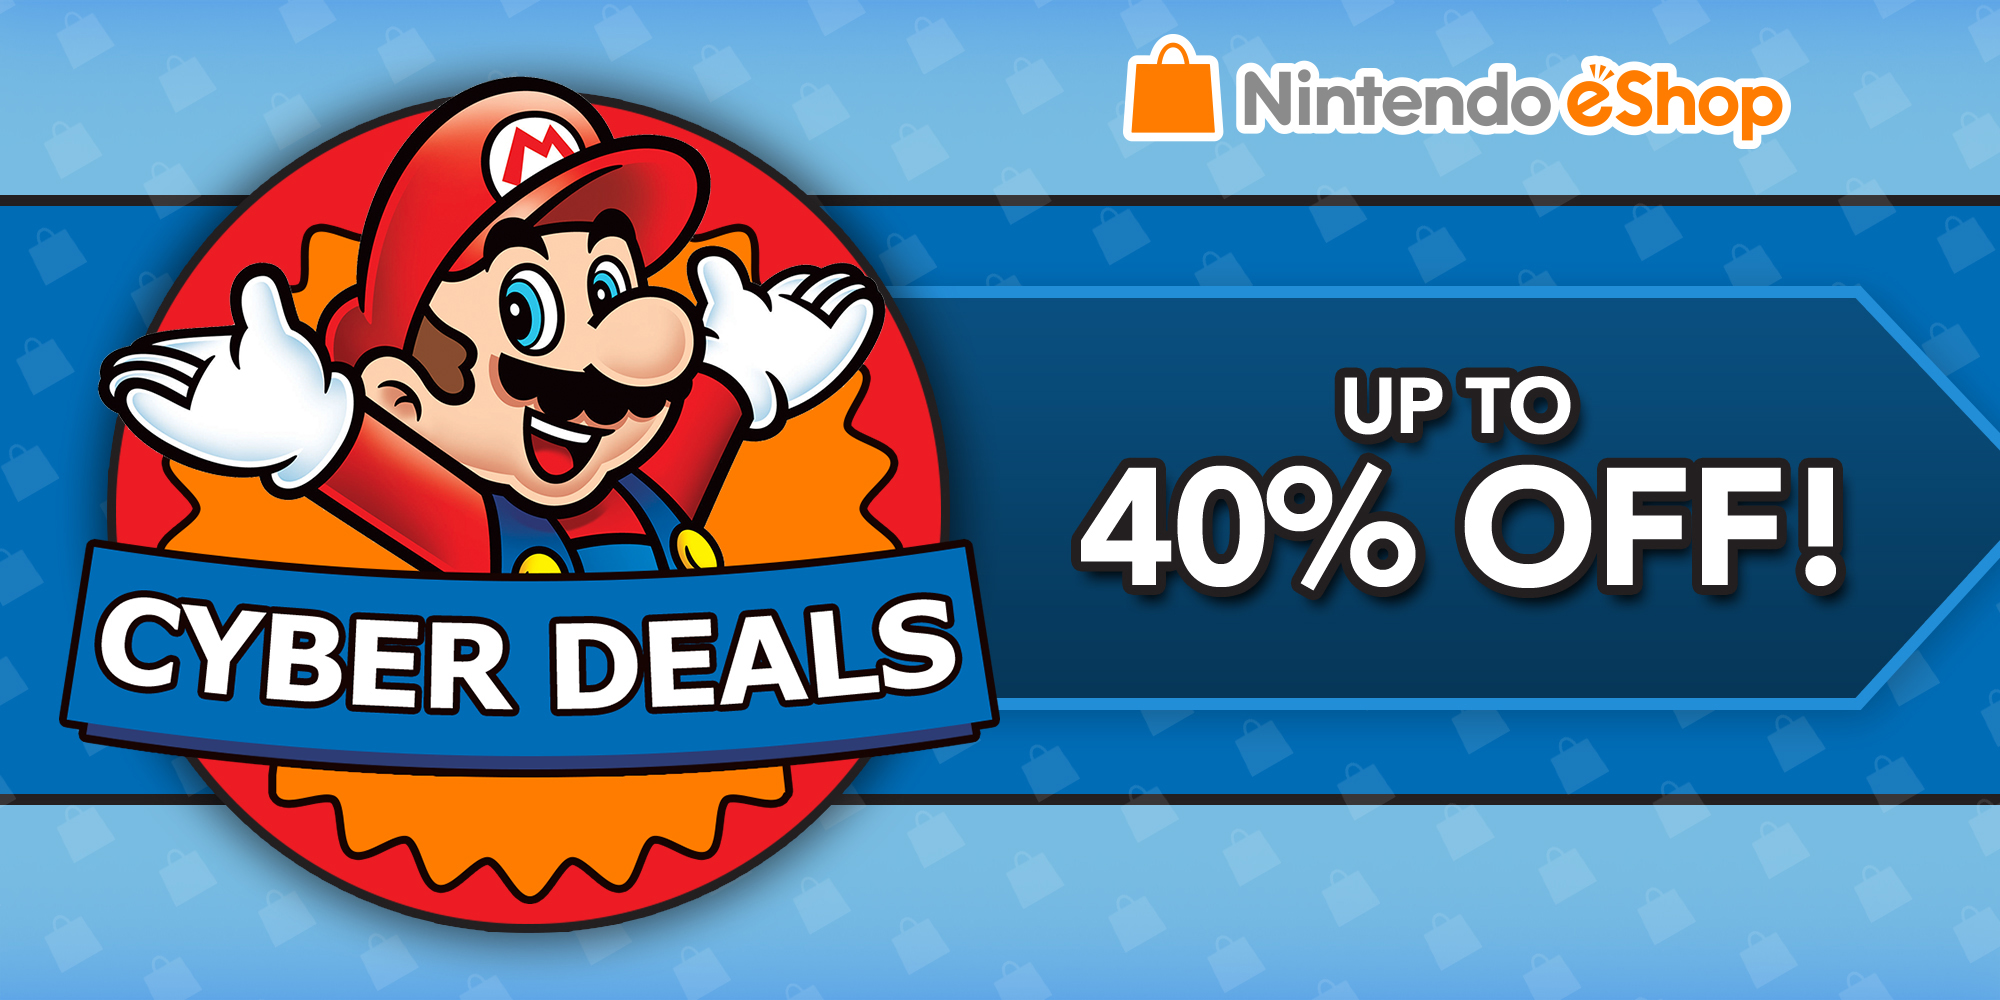 Nintendo Eshop Sale Nintendo Eshop Cyber Deals News Nintendo